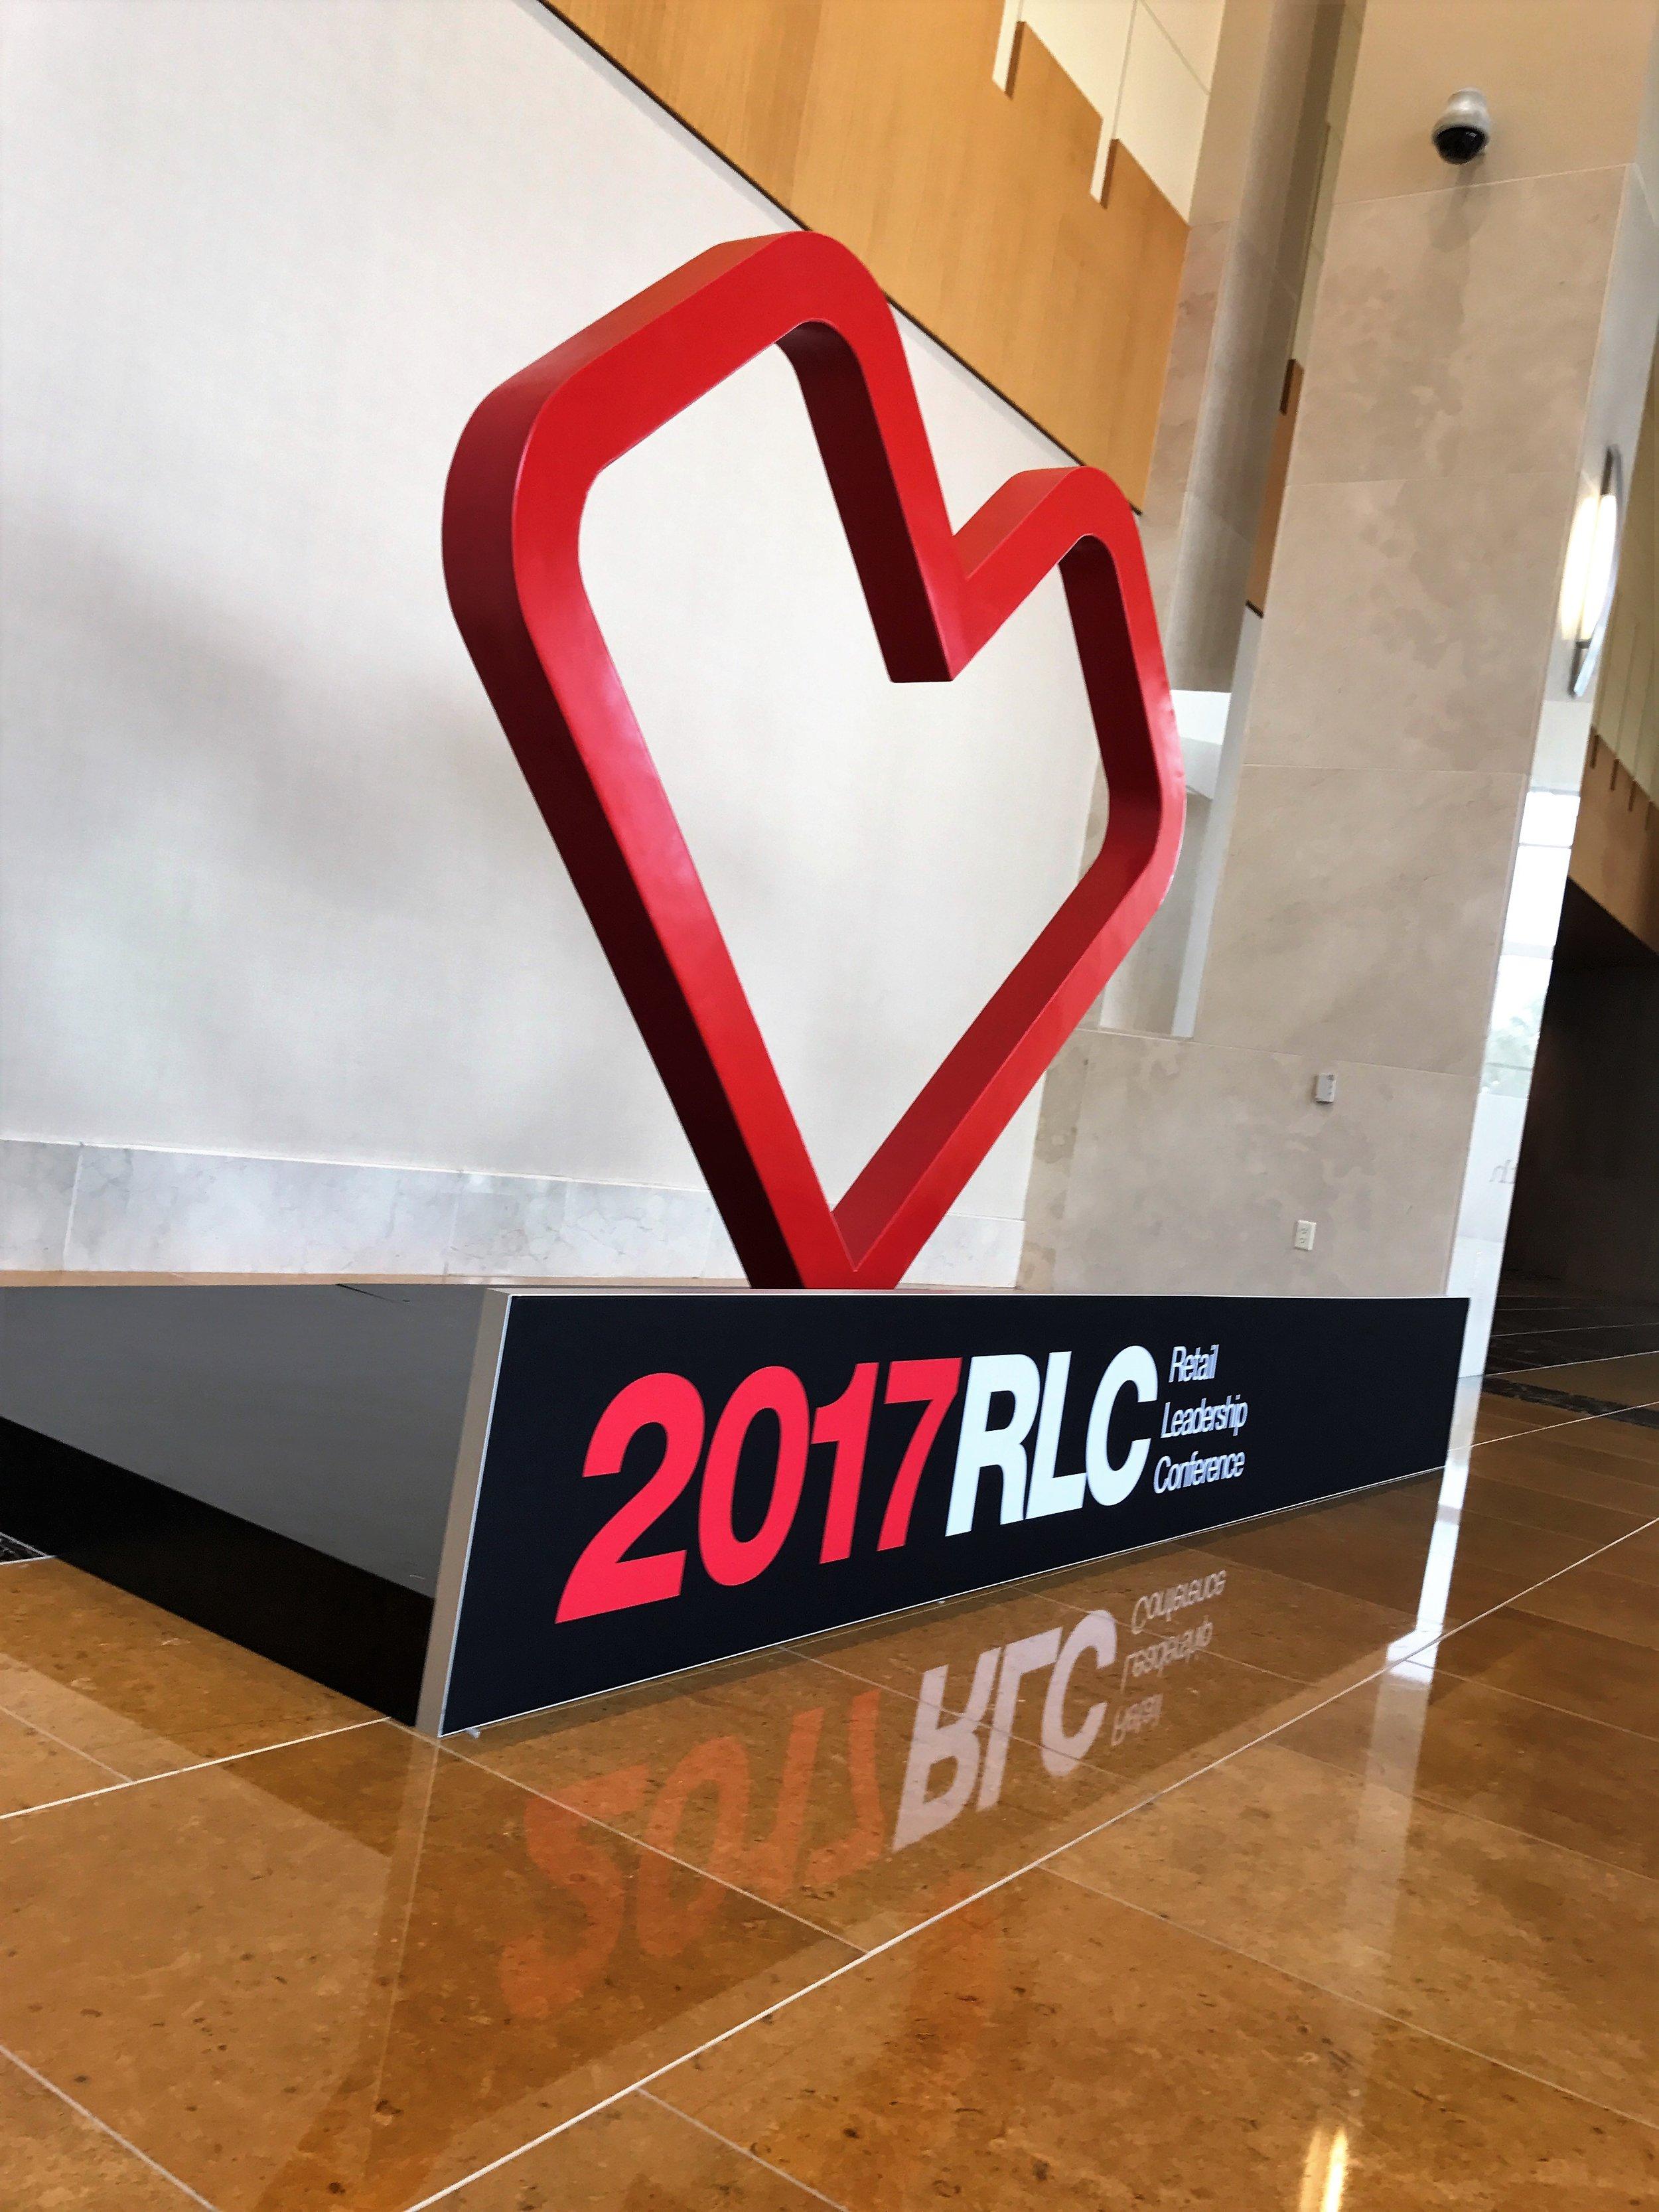 CVS RLC 2017 (GC) (10).jpg